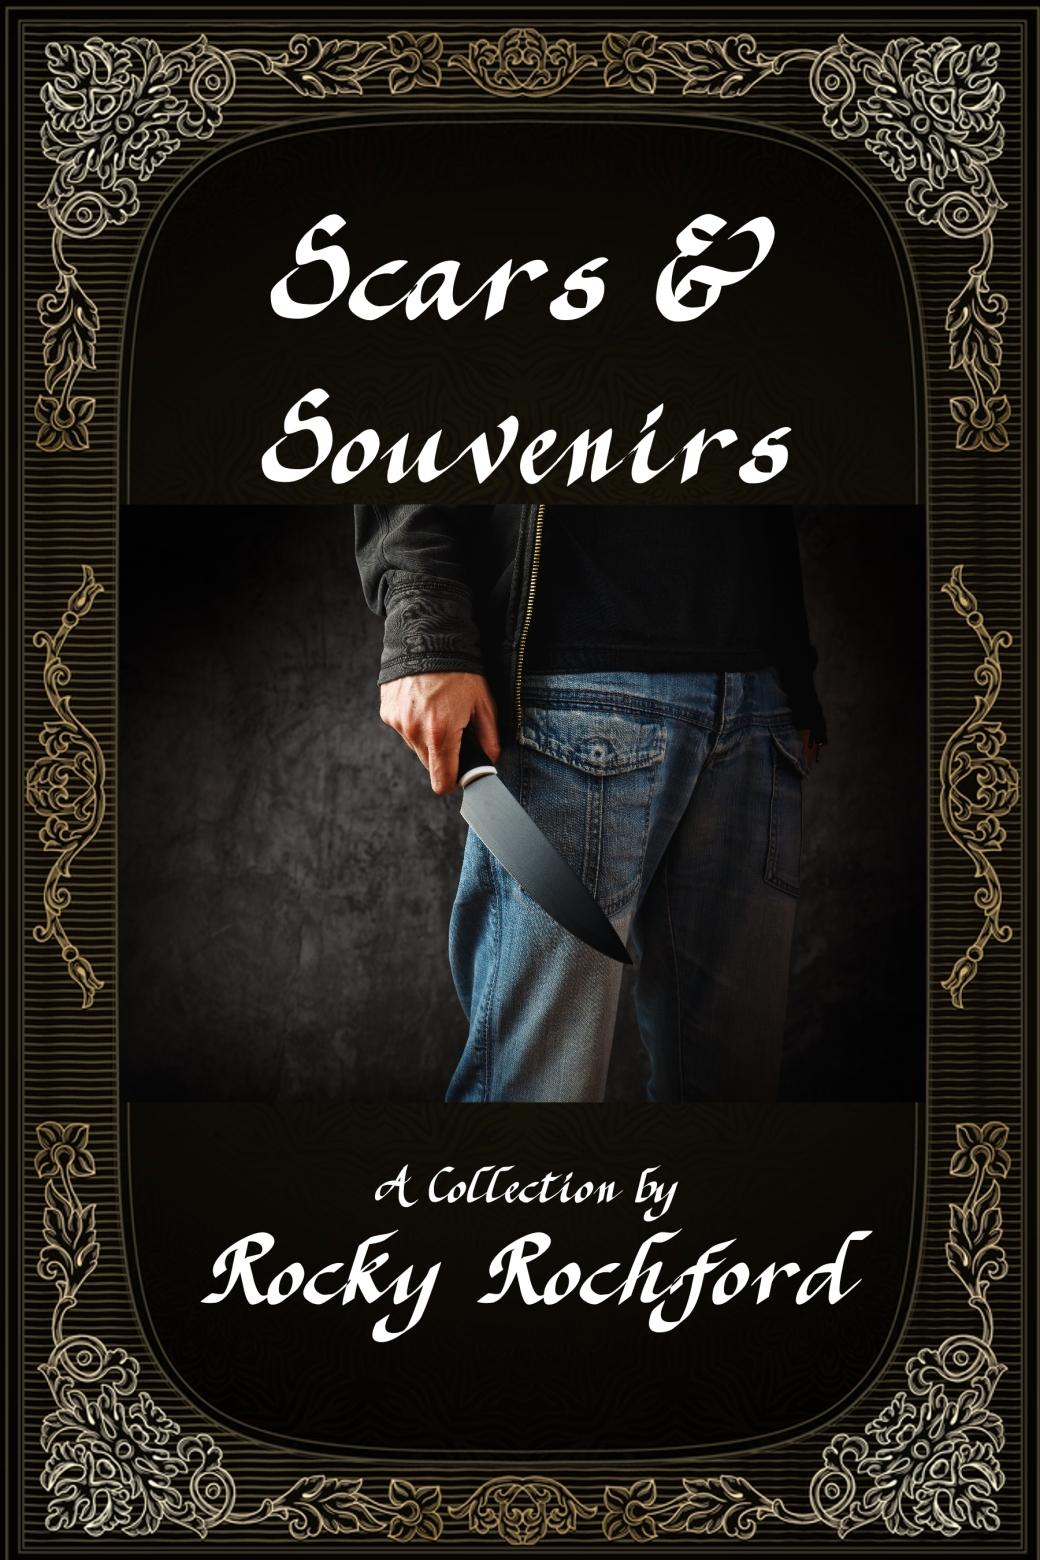 scars & souvenirs-001.jpg